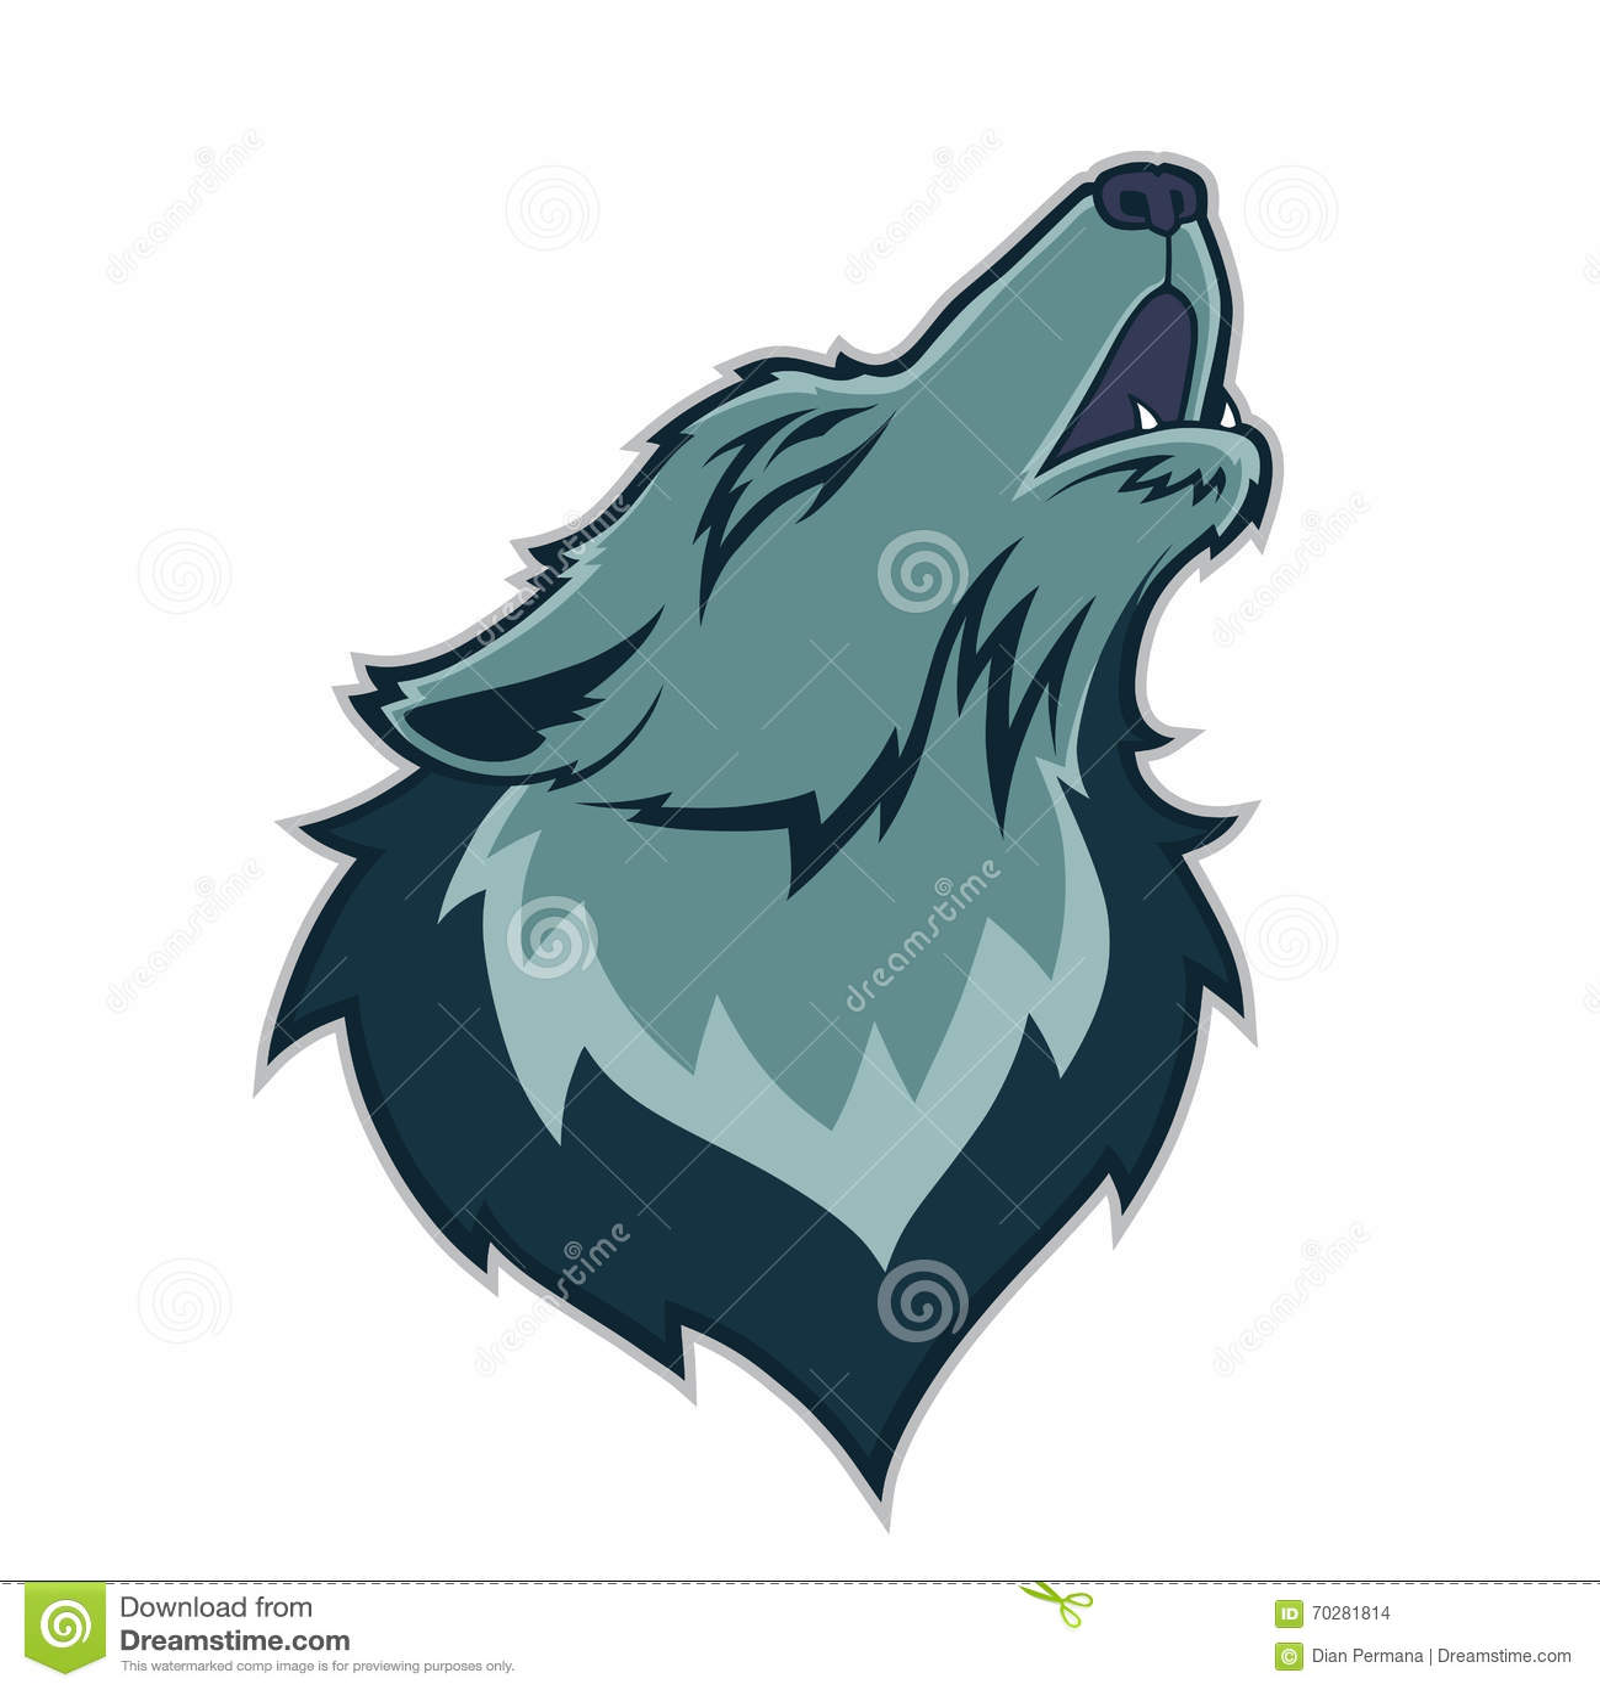 wolf illustration angry wolves  sport club or team emblem Baseball Logo Design Ideas Cool Youth Baseball Logos